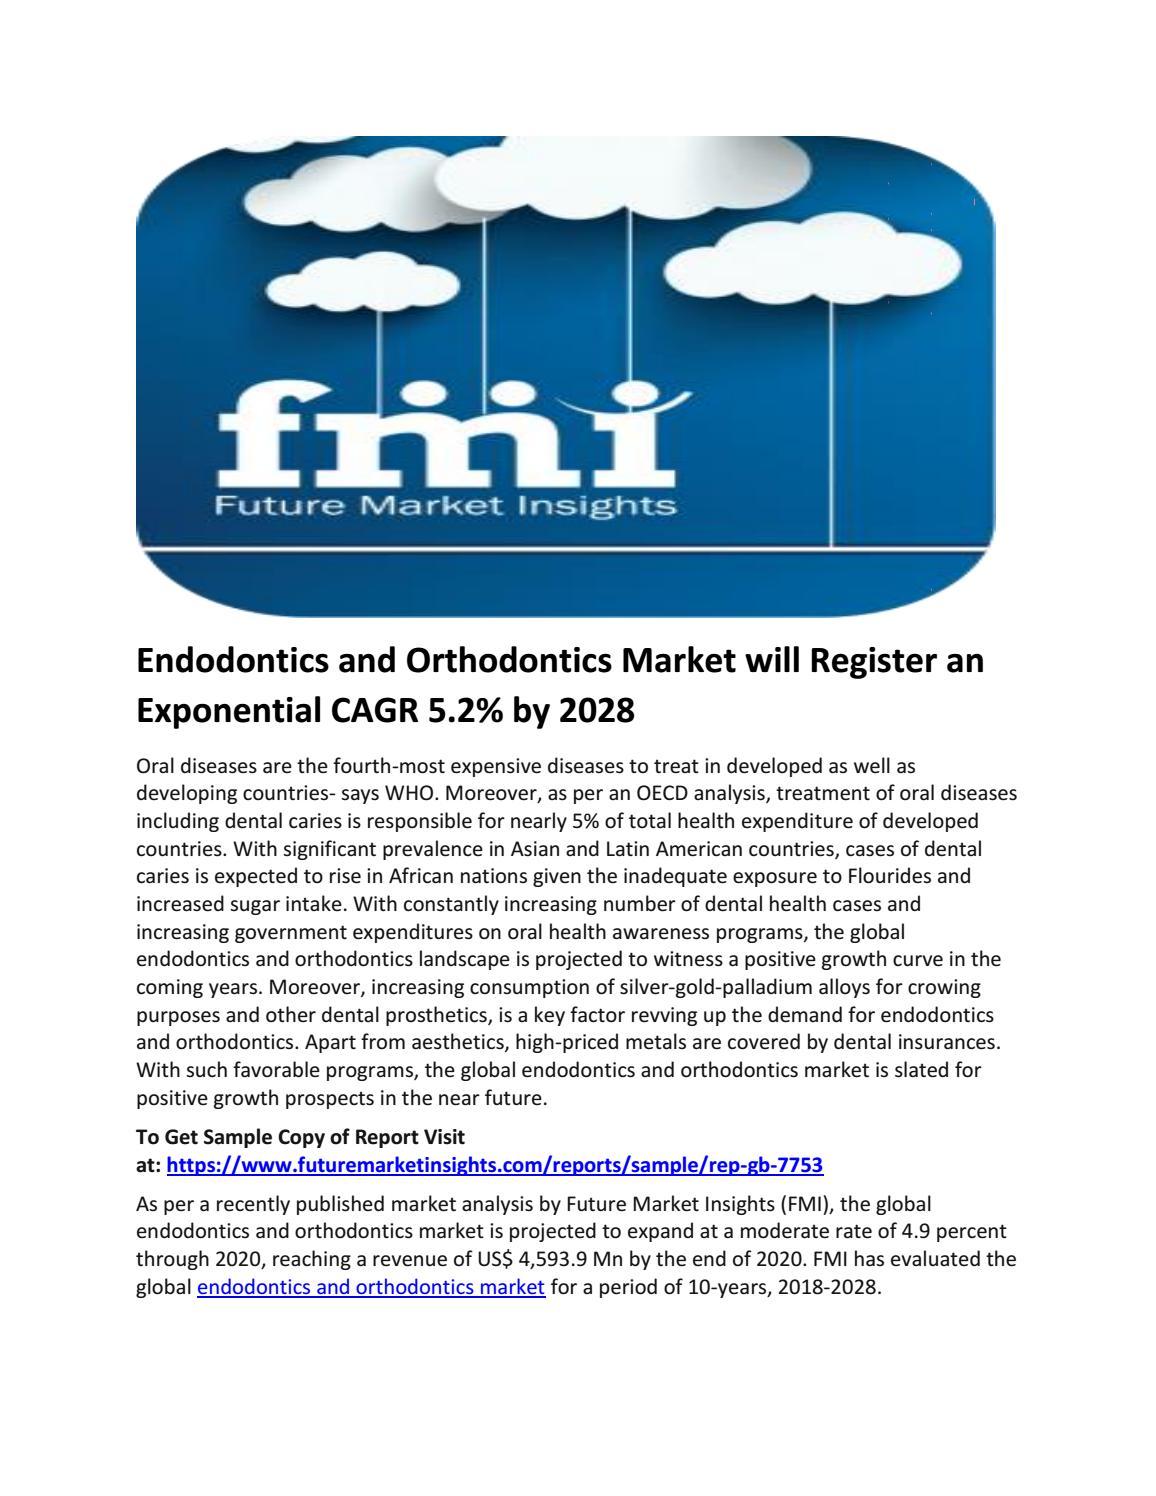 Endodontics and Orthodontics Market will Register an